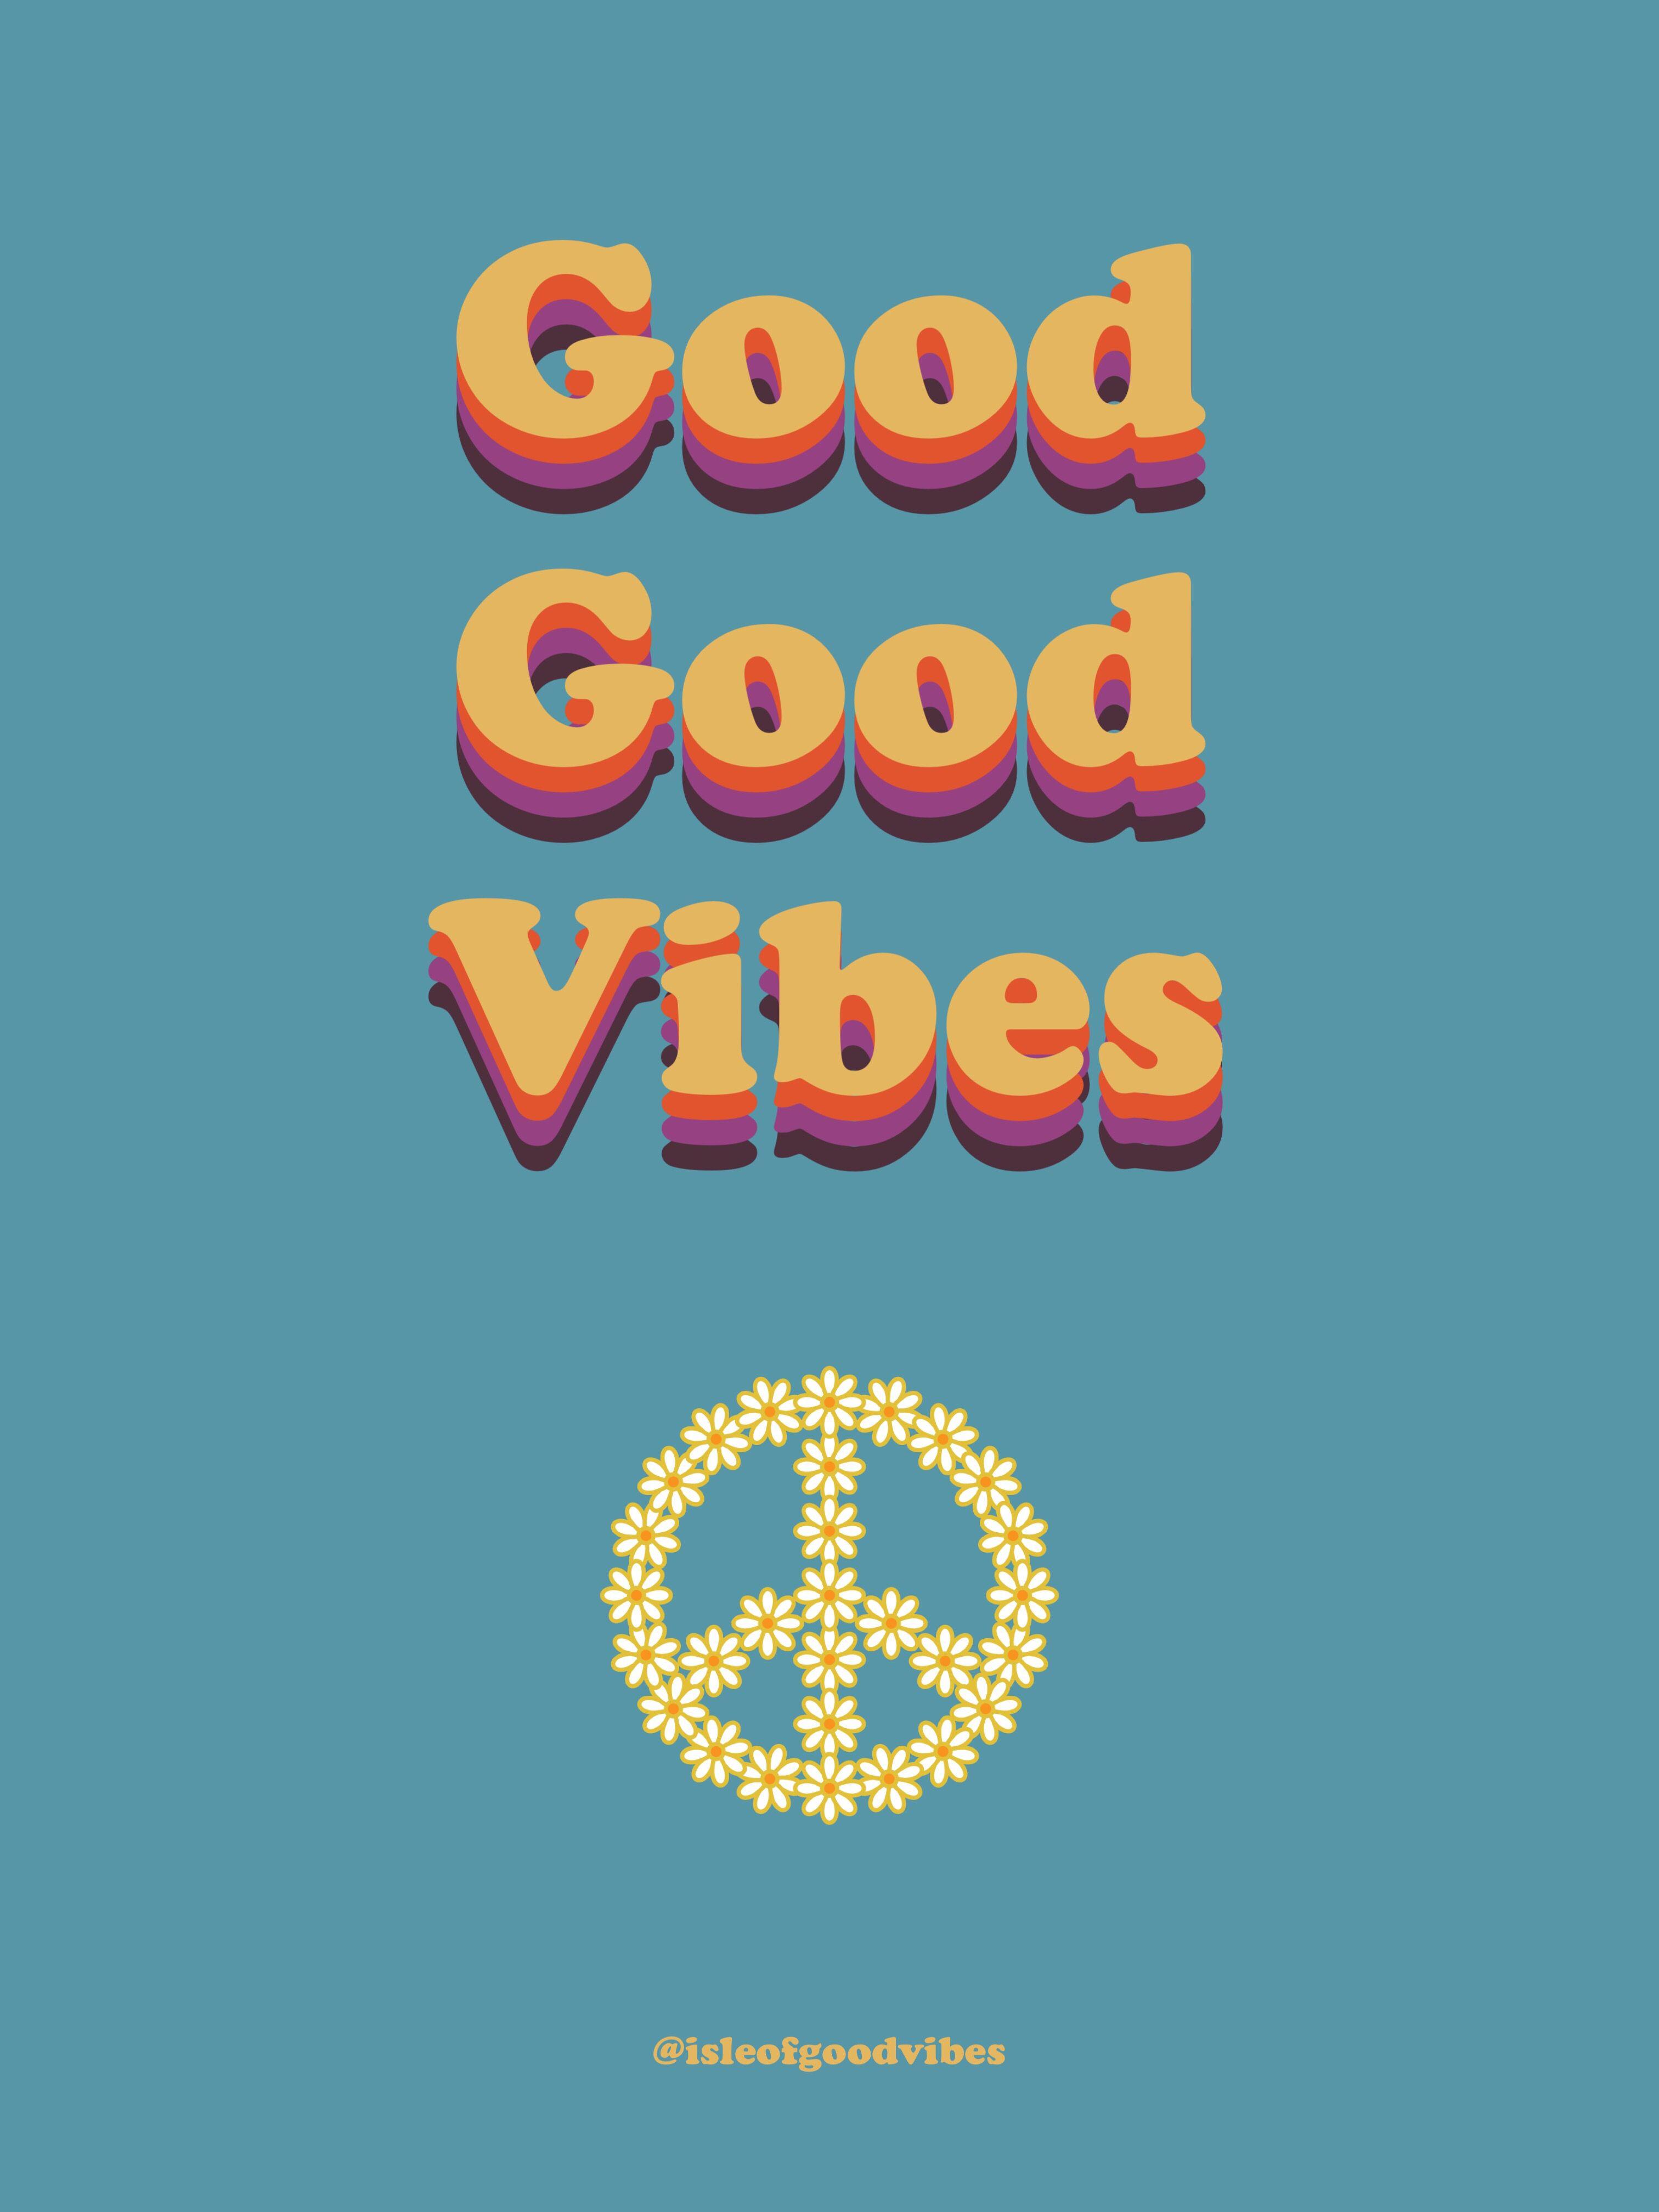 Follow Isle Of Good Vibes For More Inspiration Quotestoliveby Words Goodvibes Peace Retro Vintage Positivi Buenas Ondas Buenas Vibras Fondos De Telefono